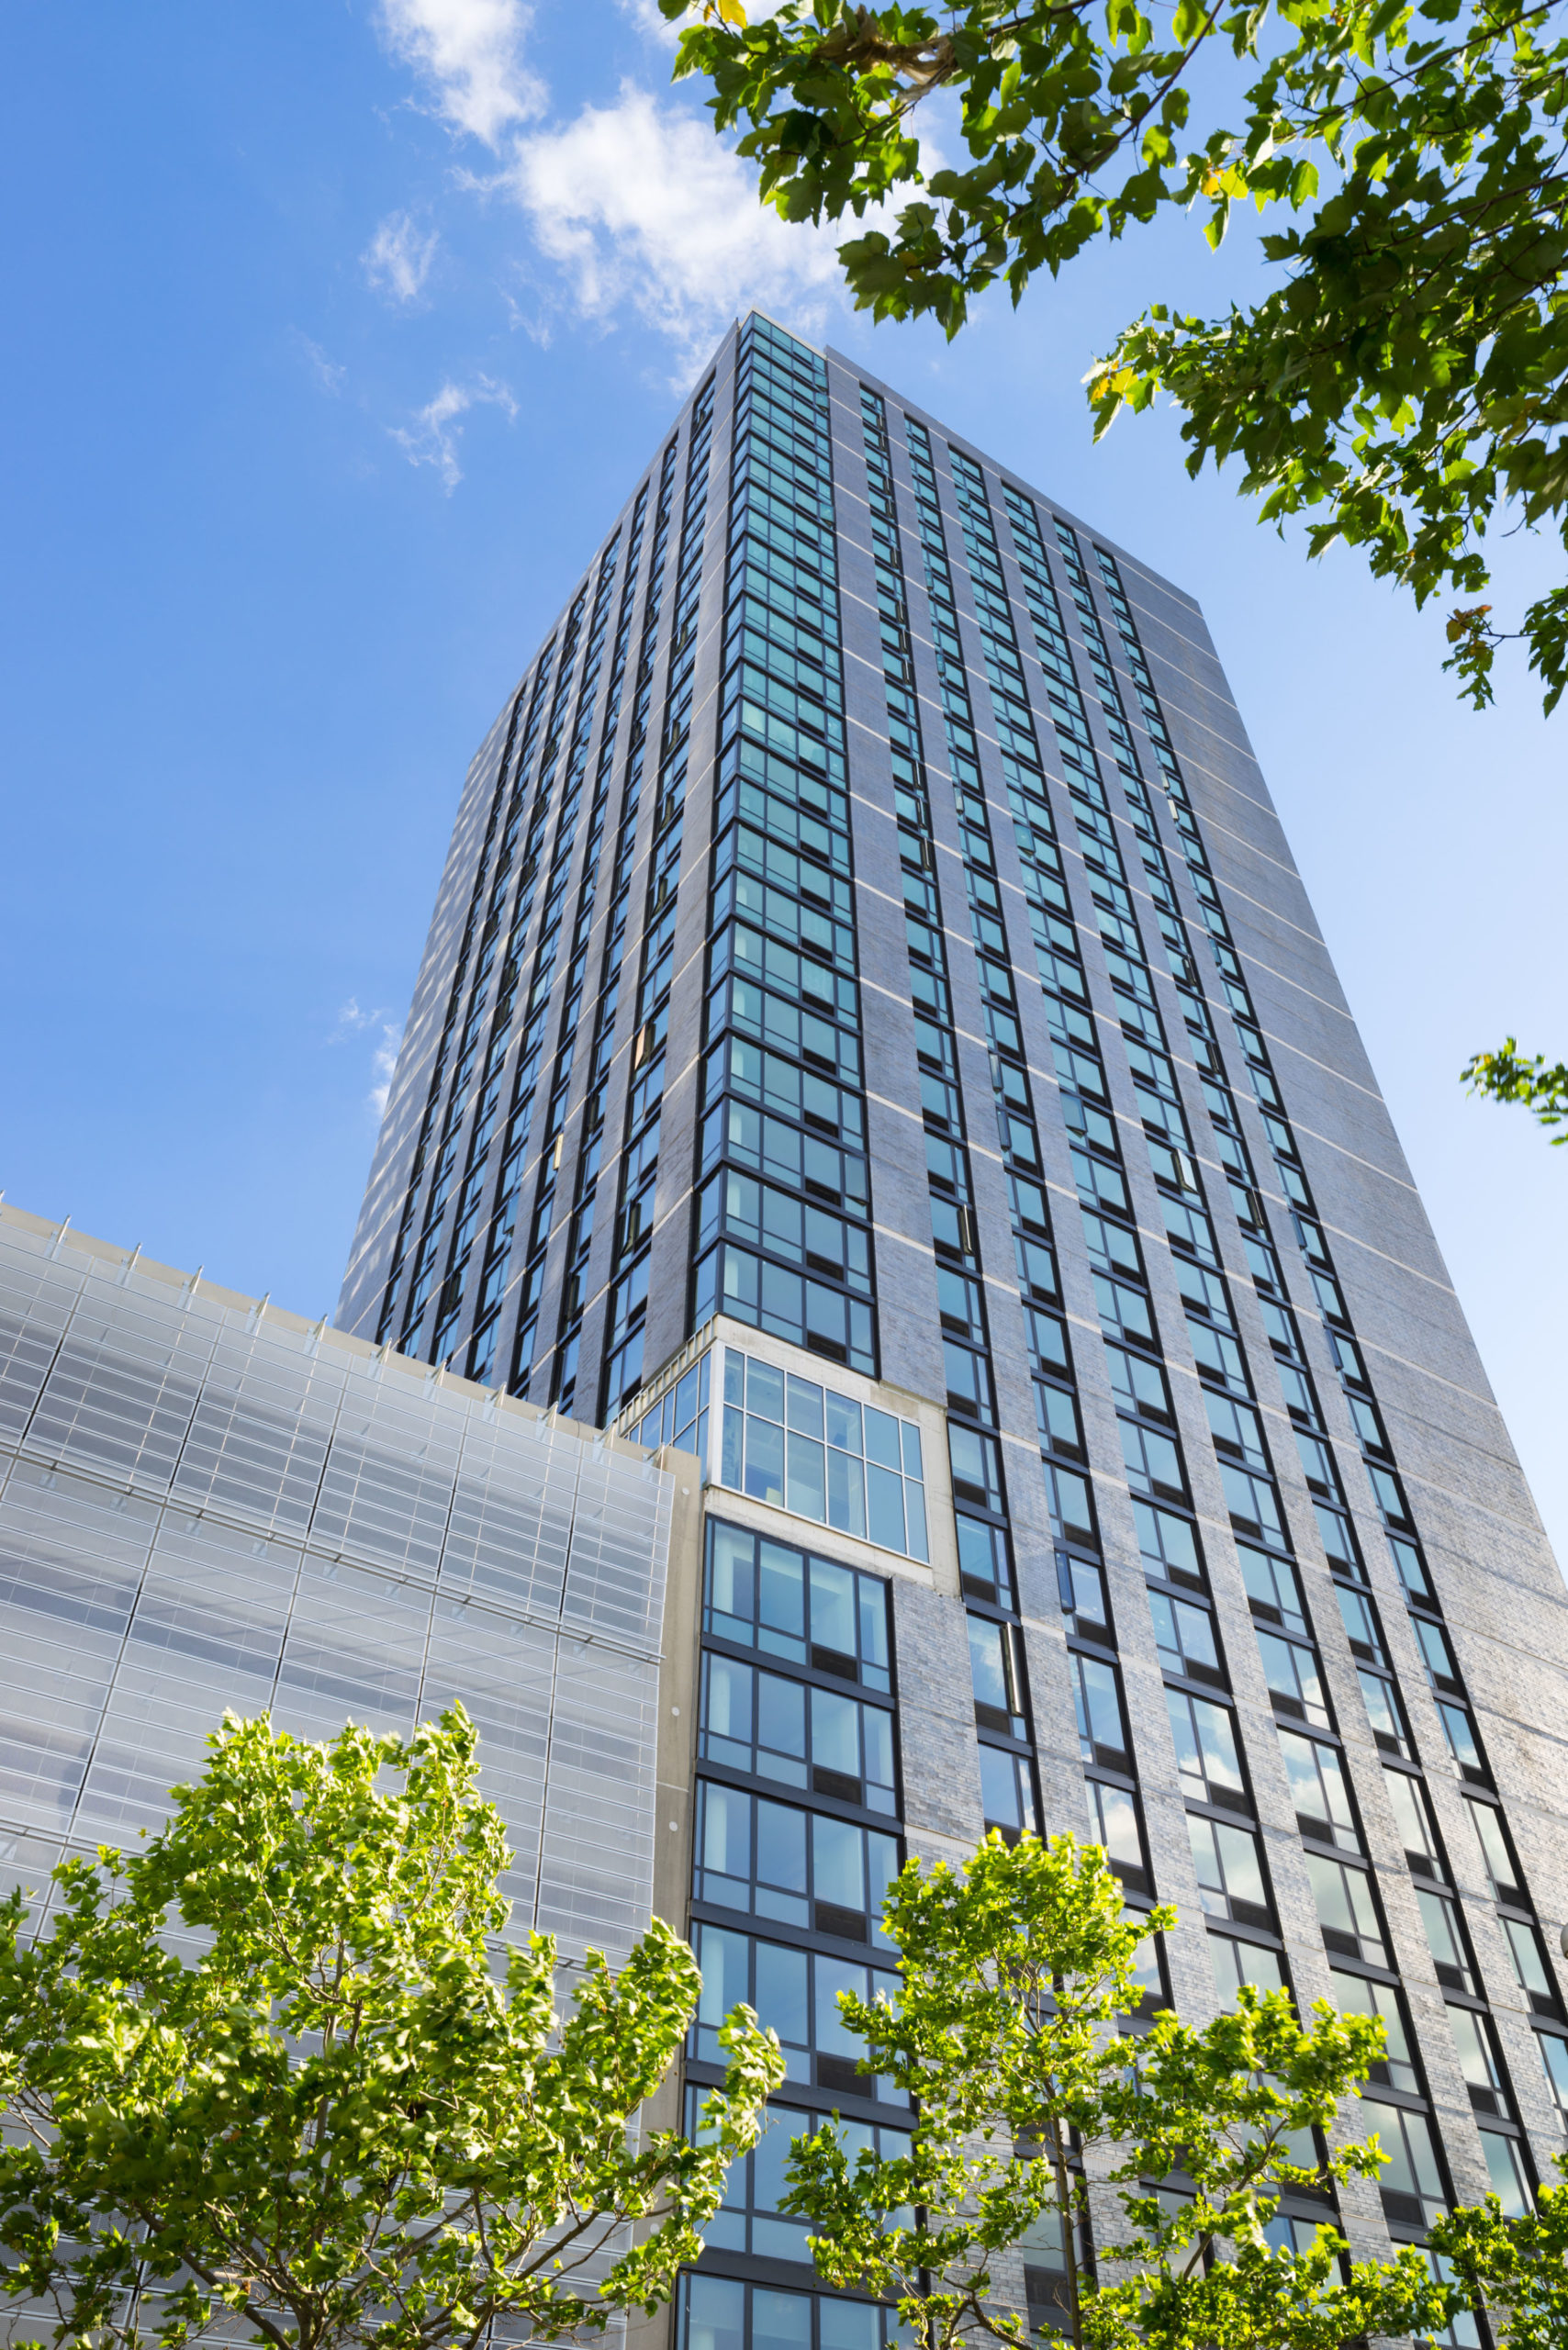 building-upward-ground-view